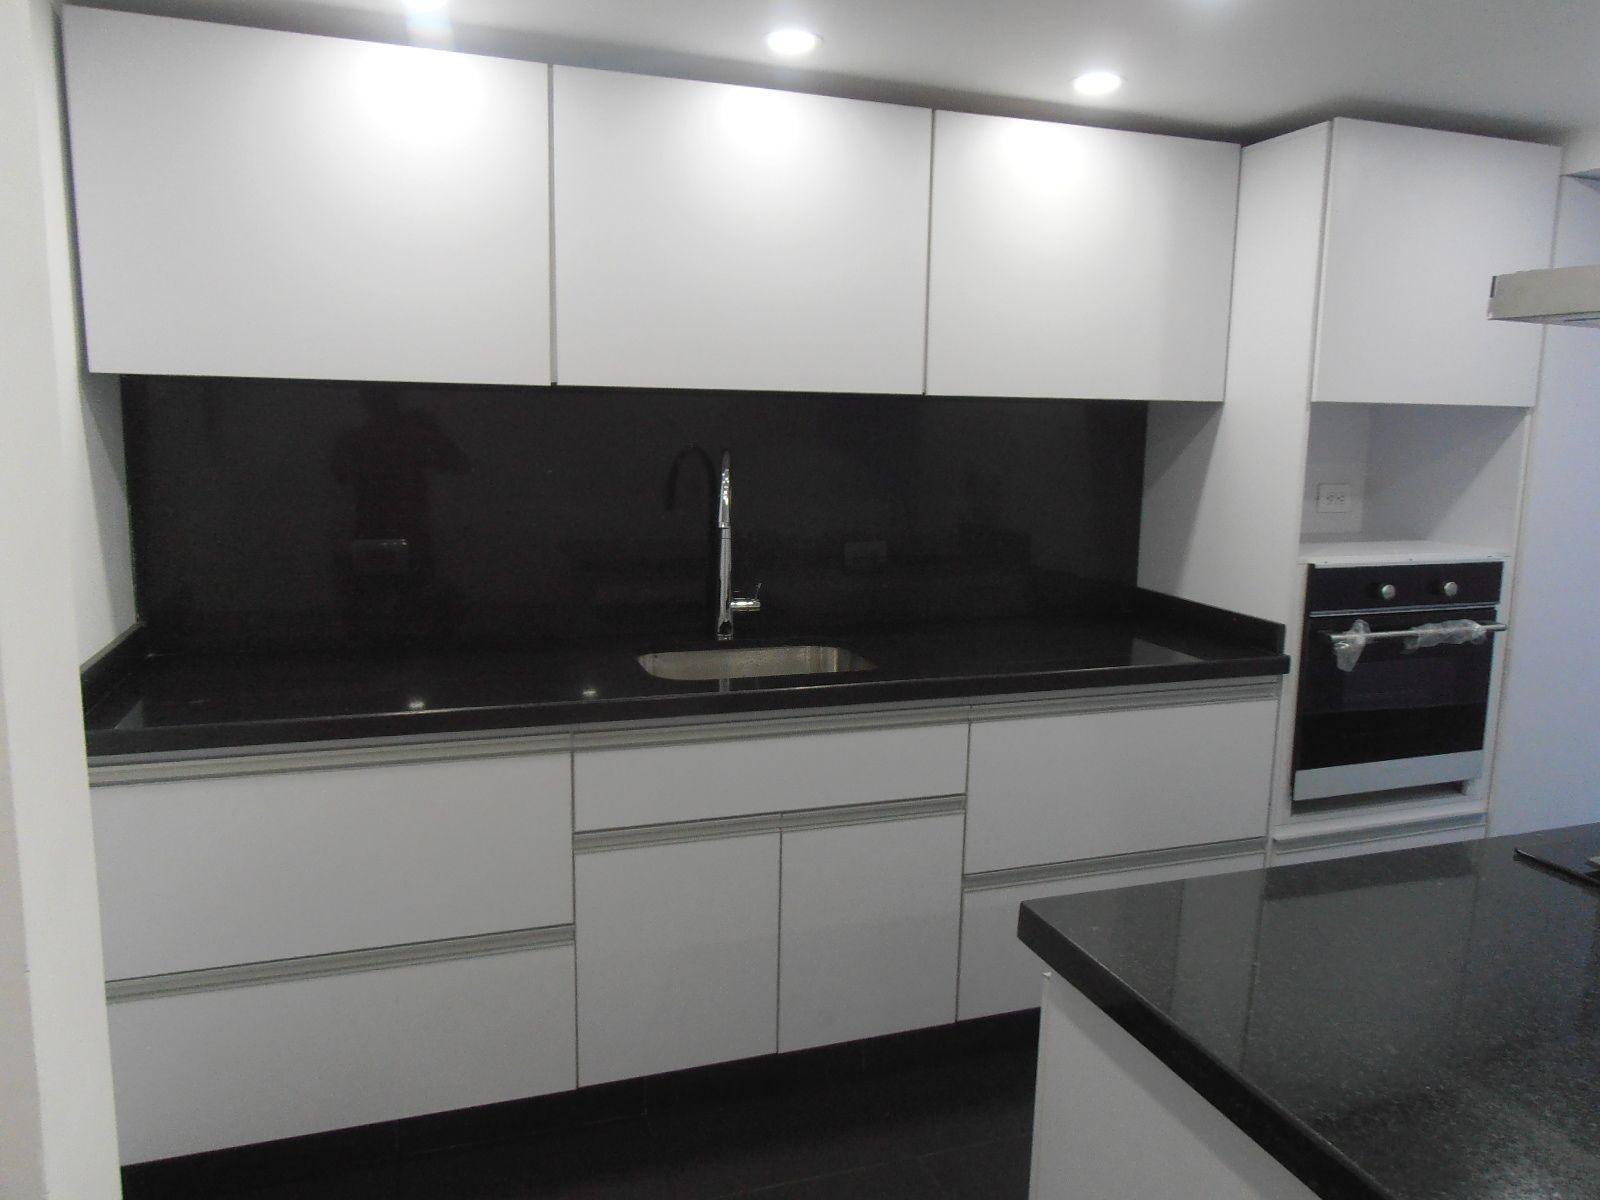 Cocina integral diseño blanca y negro | Kitchen | Pinterest ...